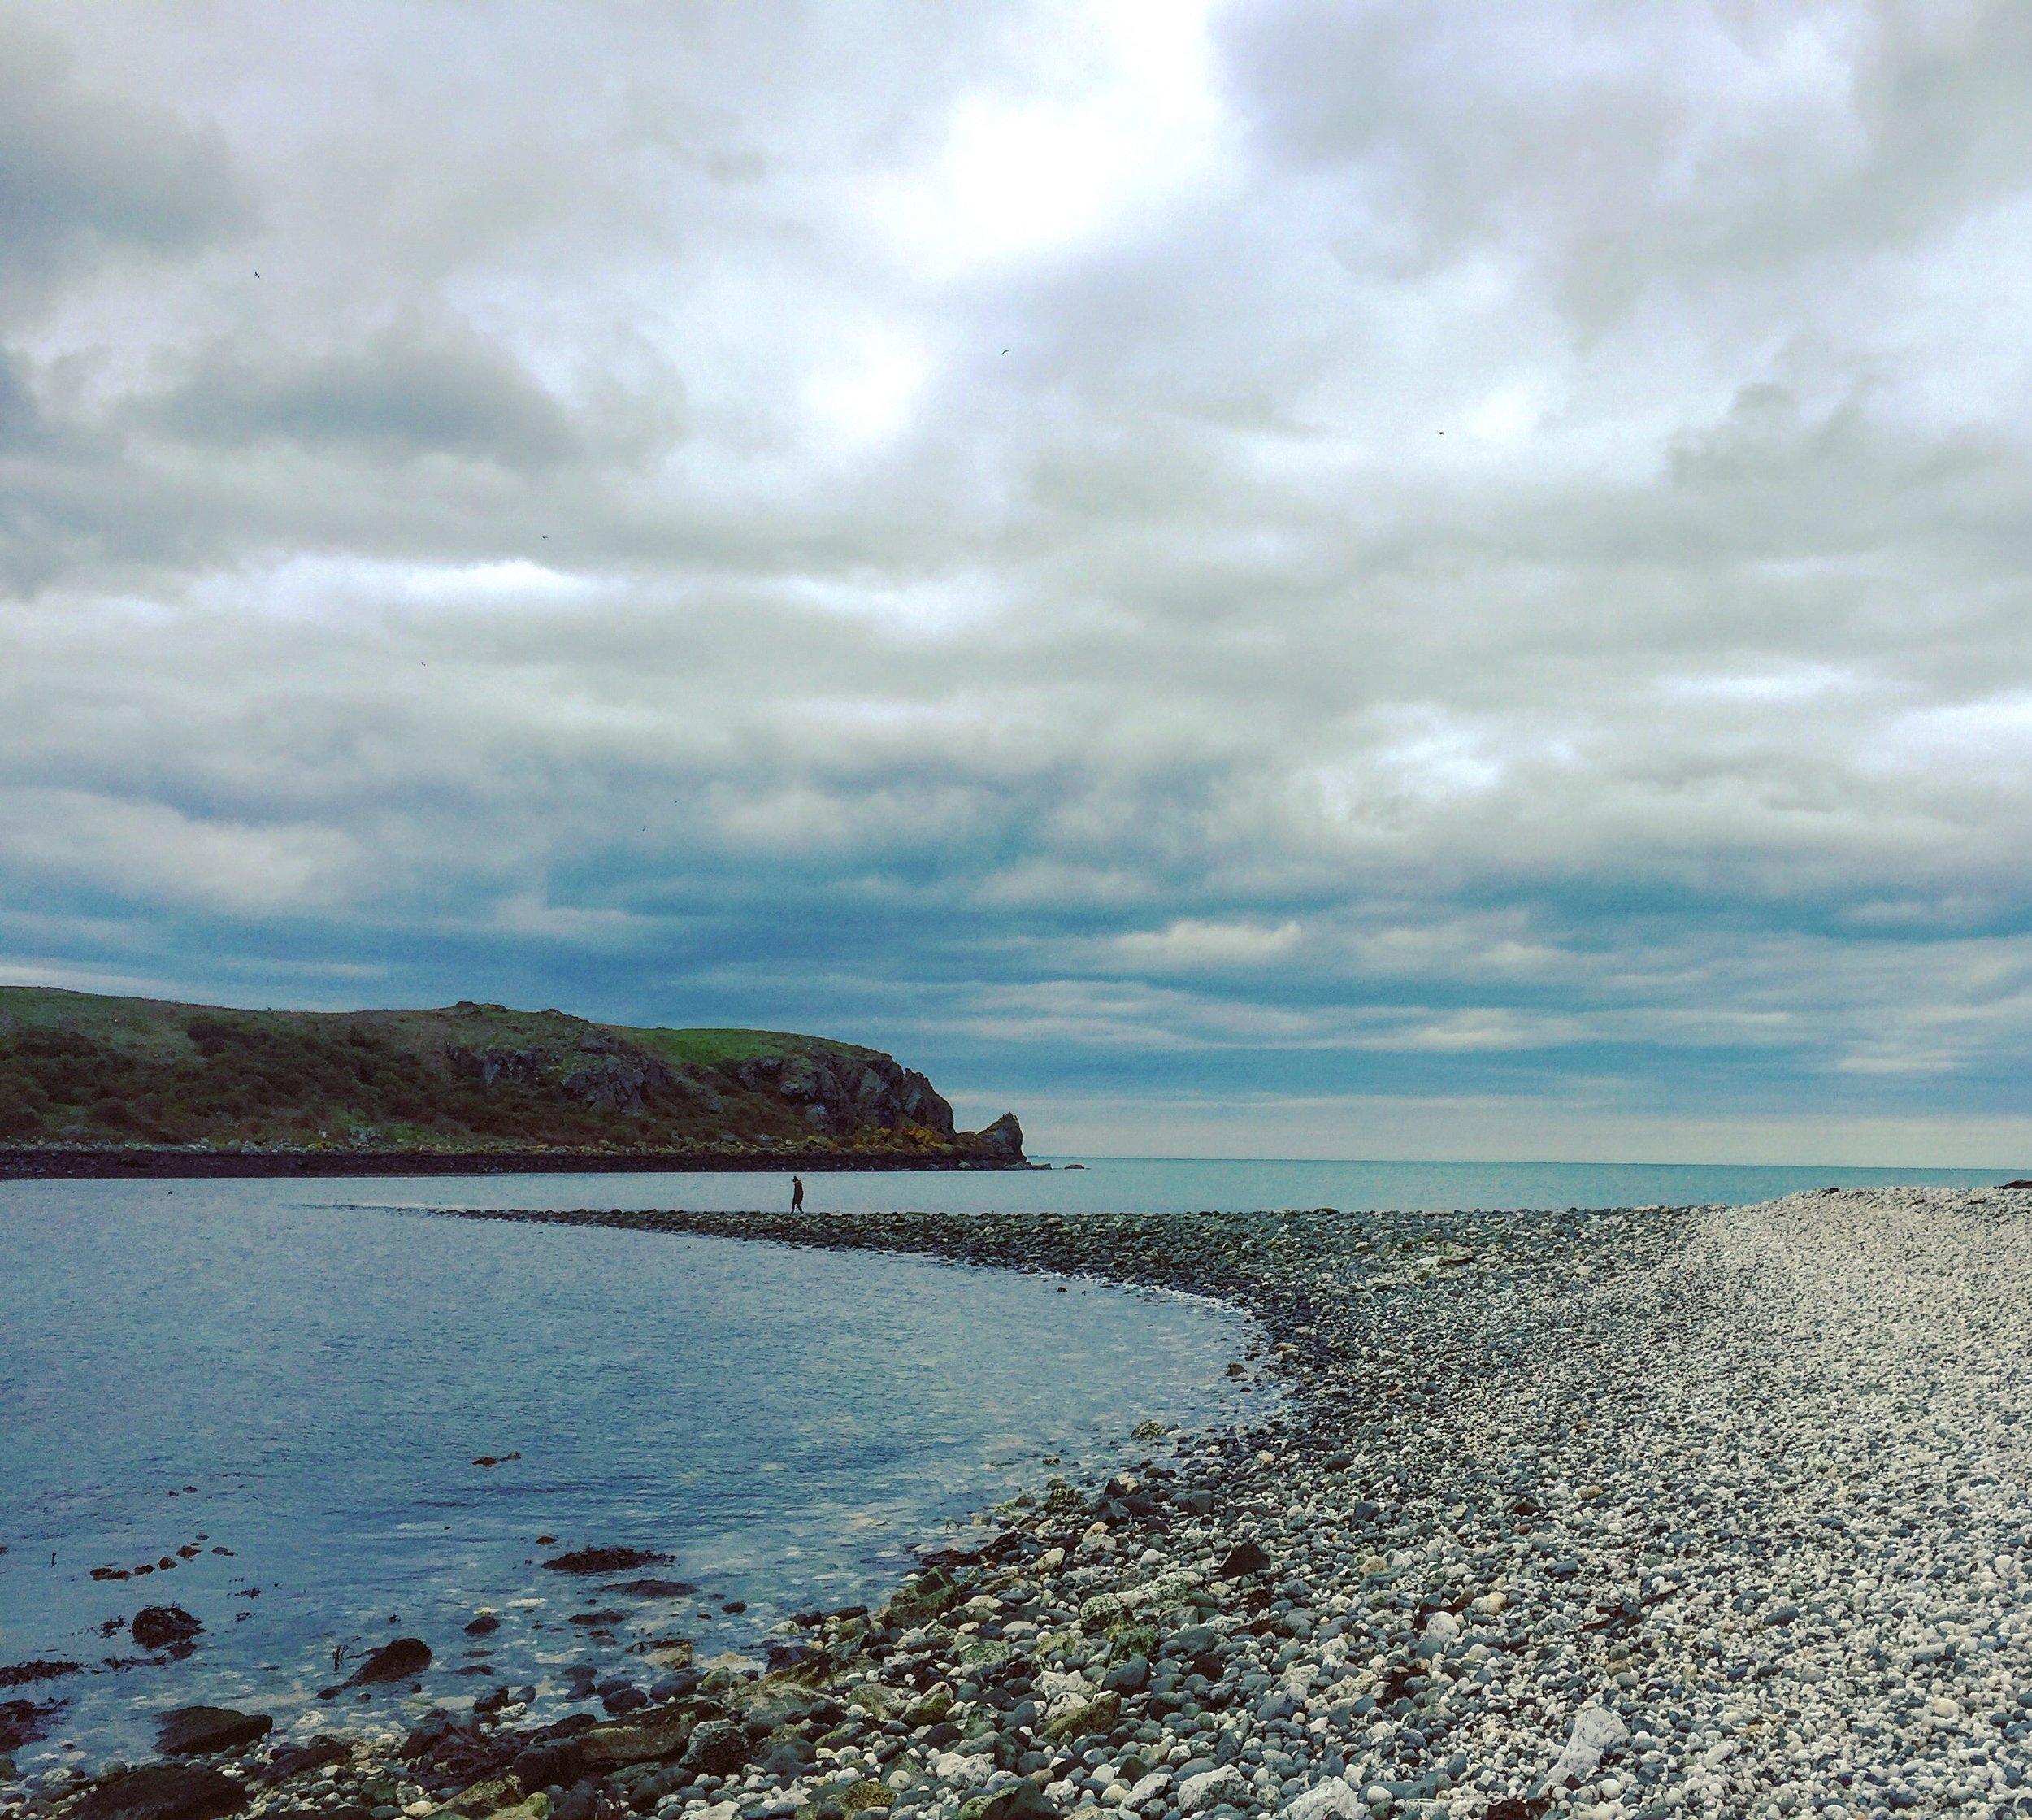 blue_pebble_beach_panoramic_muck_island_portmuck_harbour_islandmagee_antrim_roadtrip_coast_ni_explorer_niexplorer_northern_ireland_blog.jpg